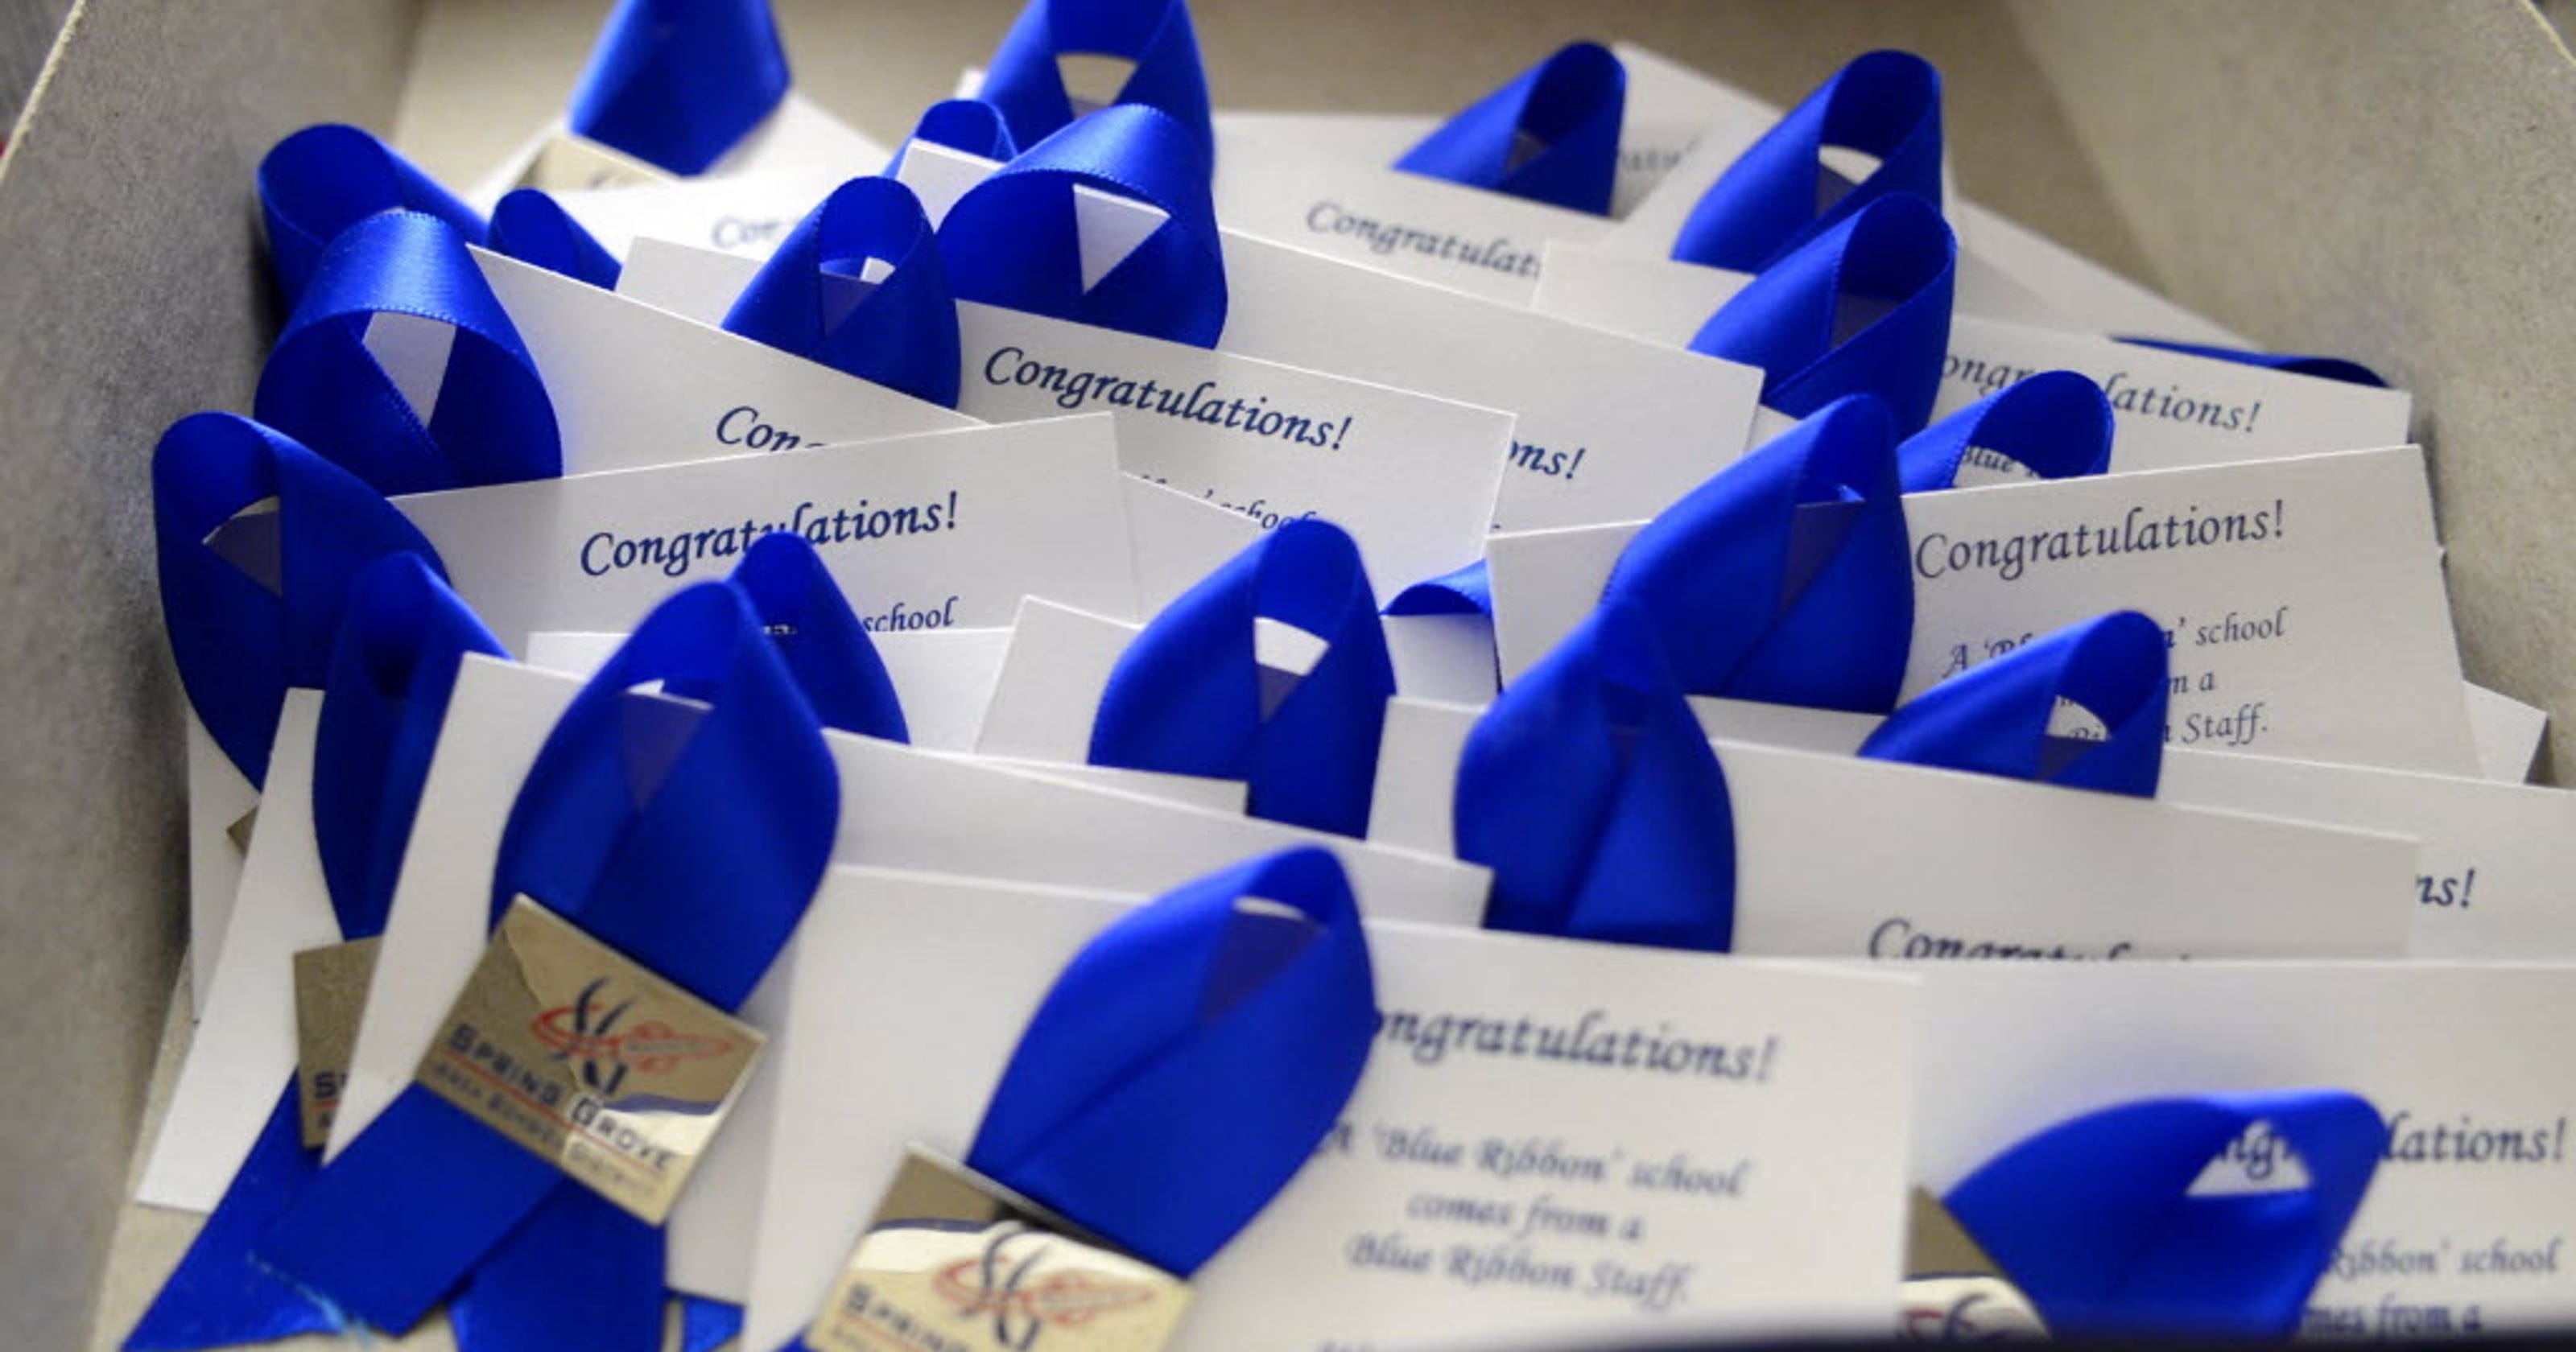 Help celebrate Paradise Elementary School's Blue Ribbon win